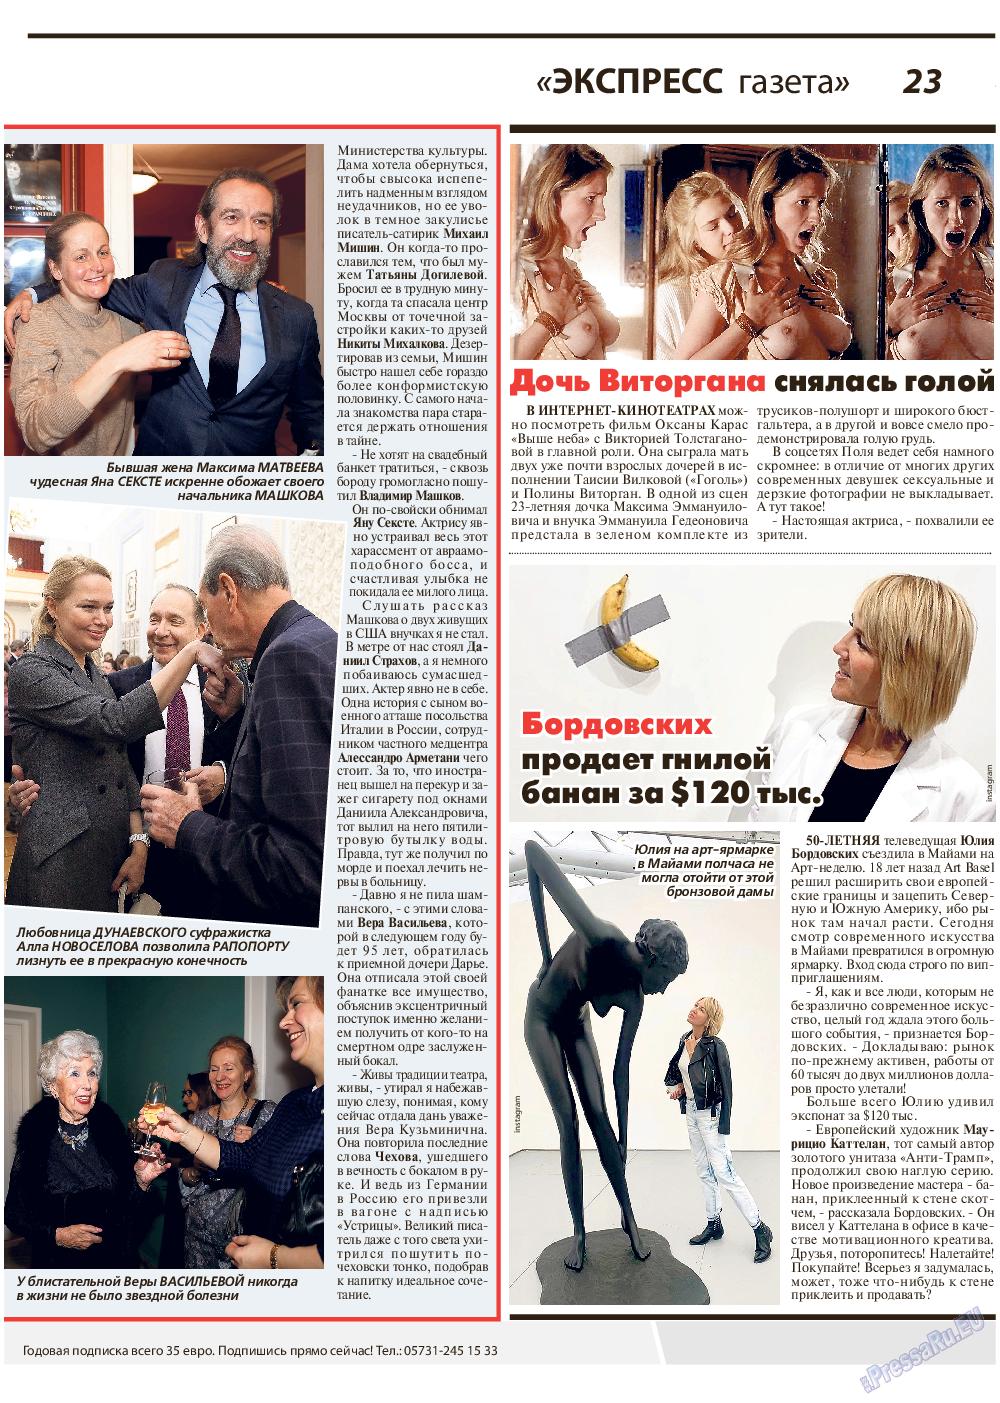 Экспресс газета (газета). 2020 год, номер 1, стр. 23